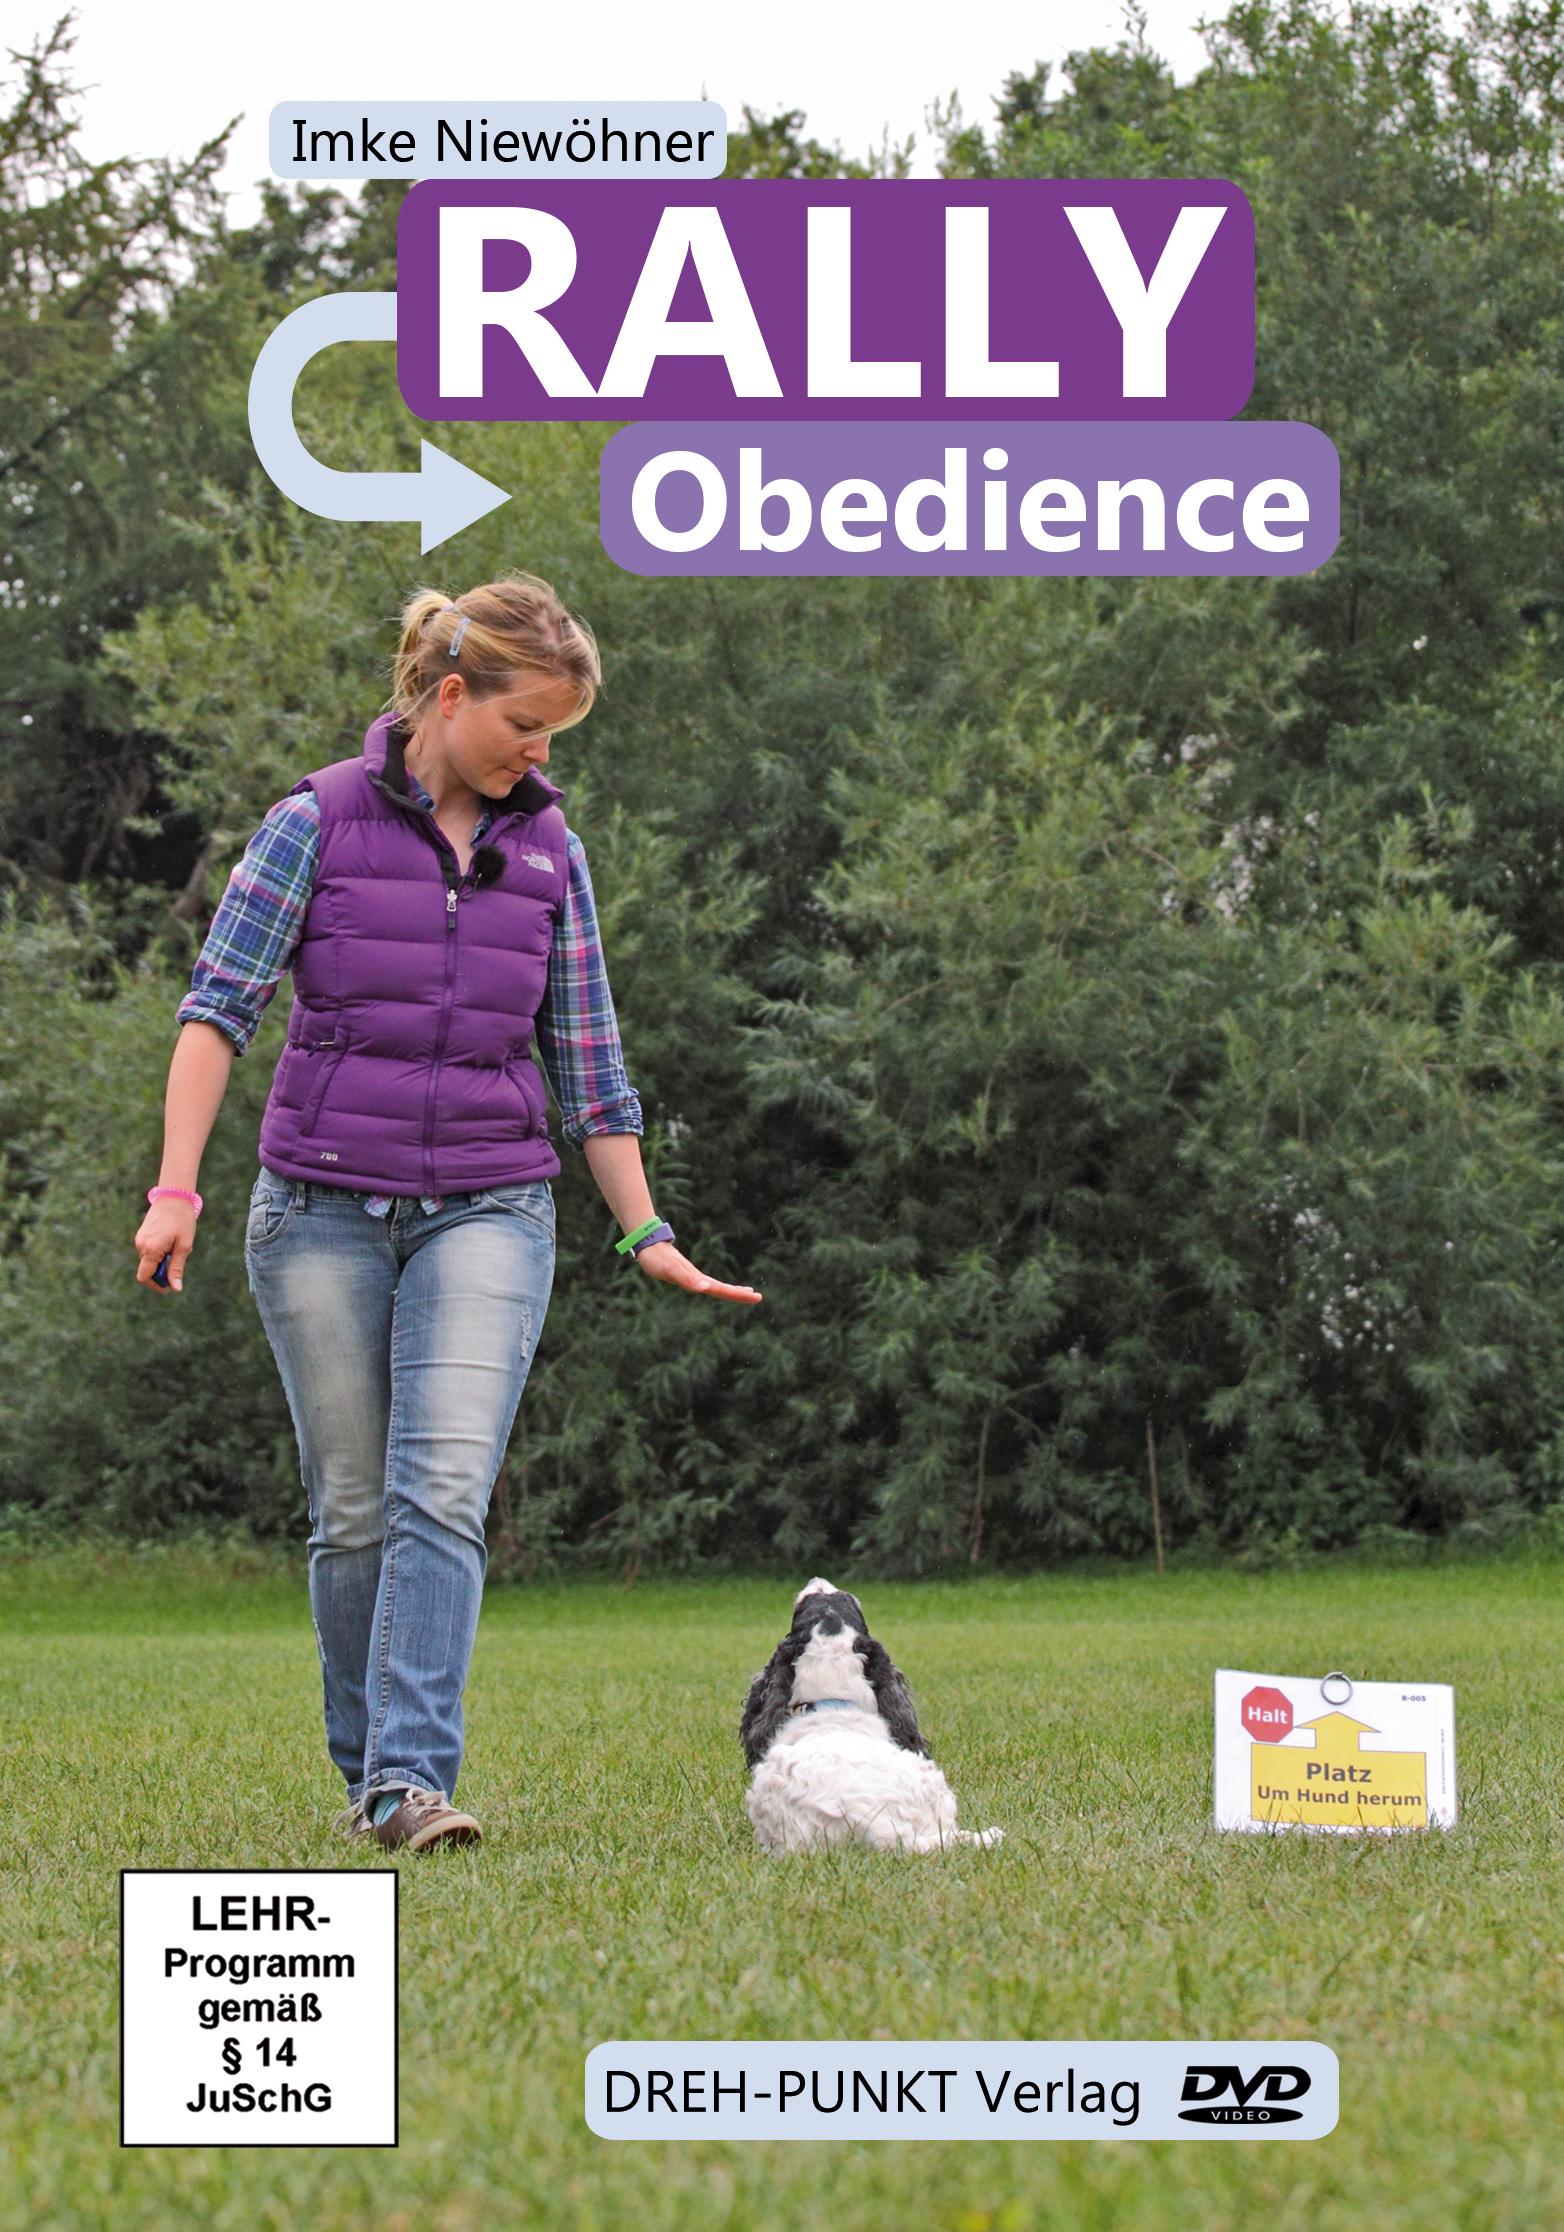 Rally Obedience - Imke Niewöhner [2 DVDs] - Nie...